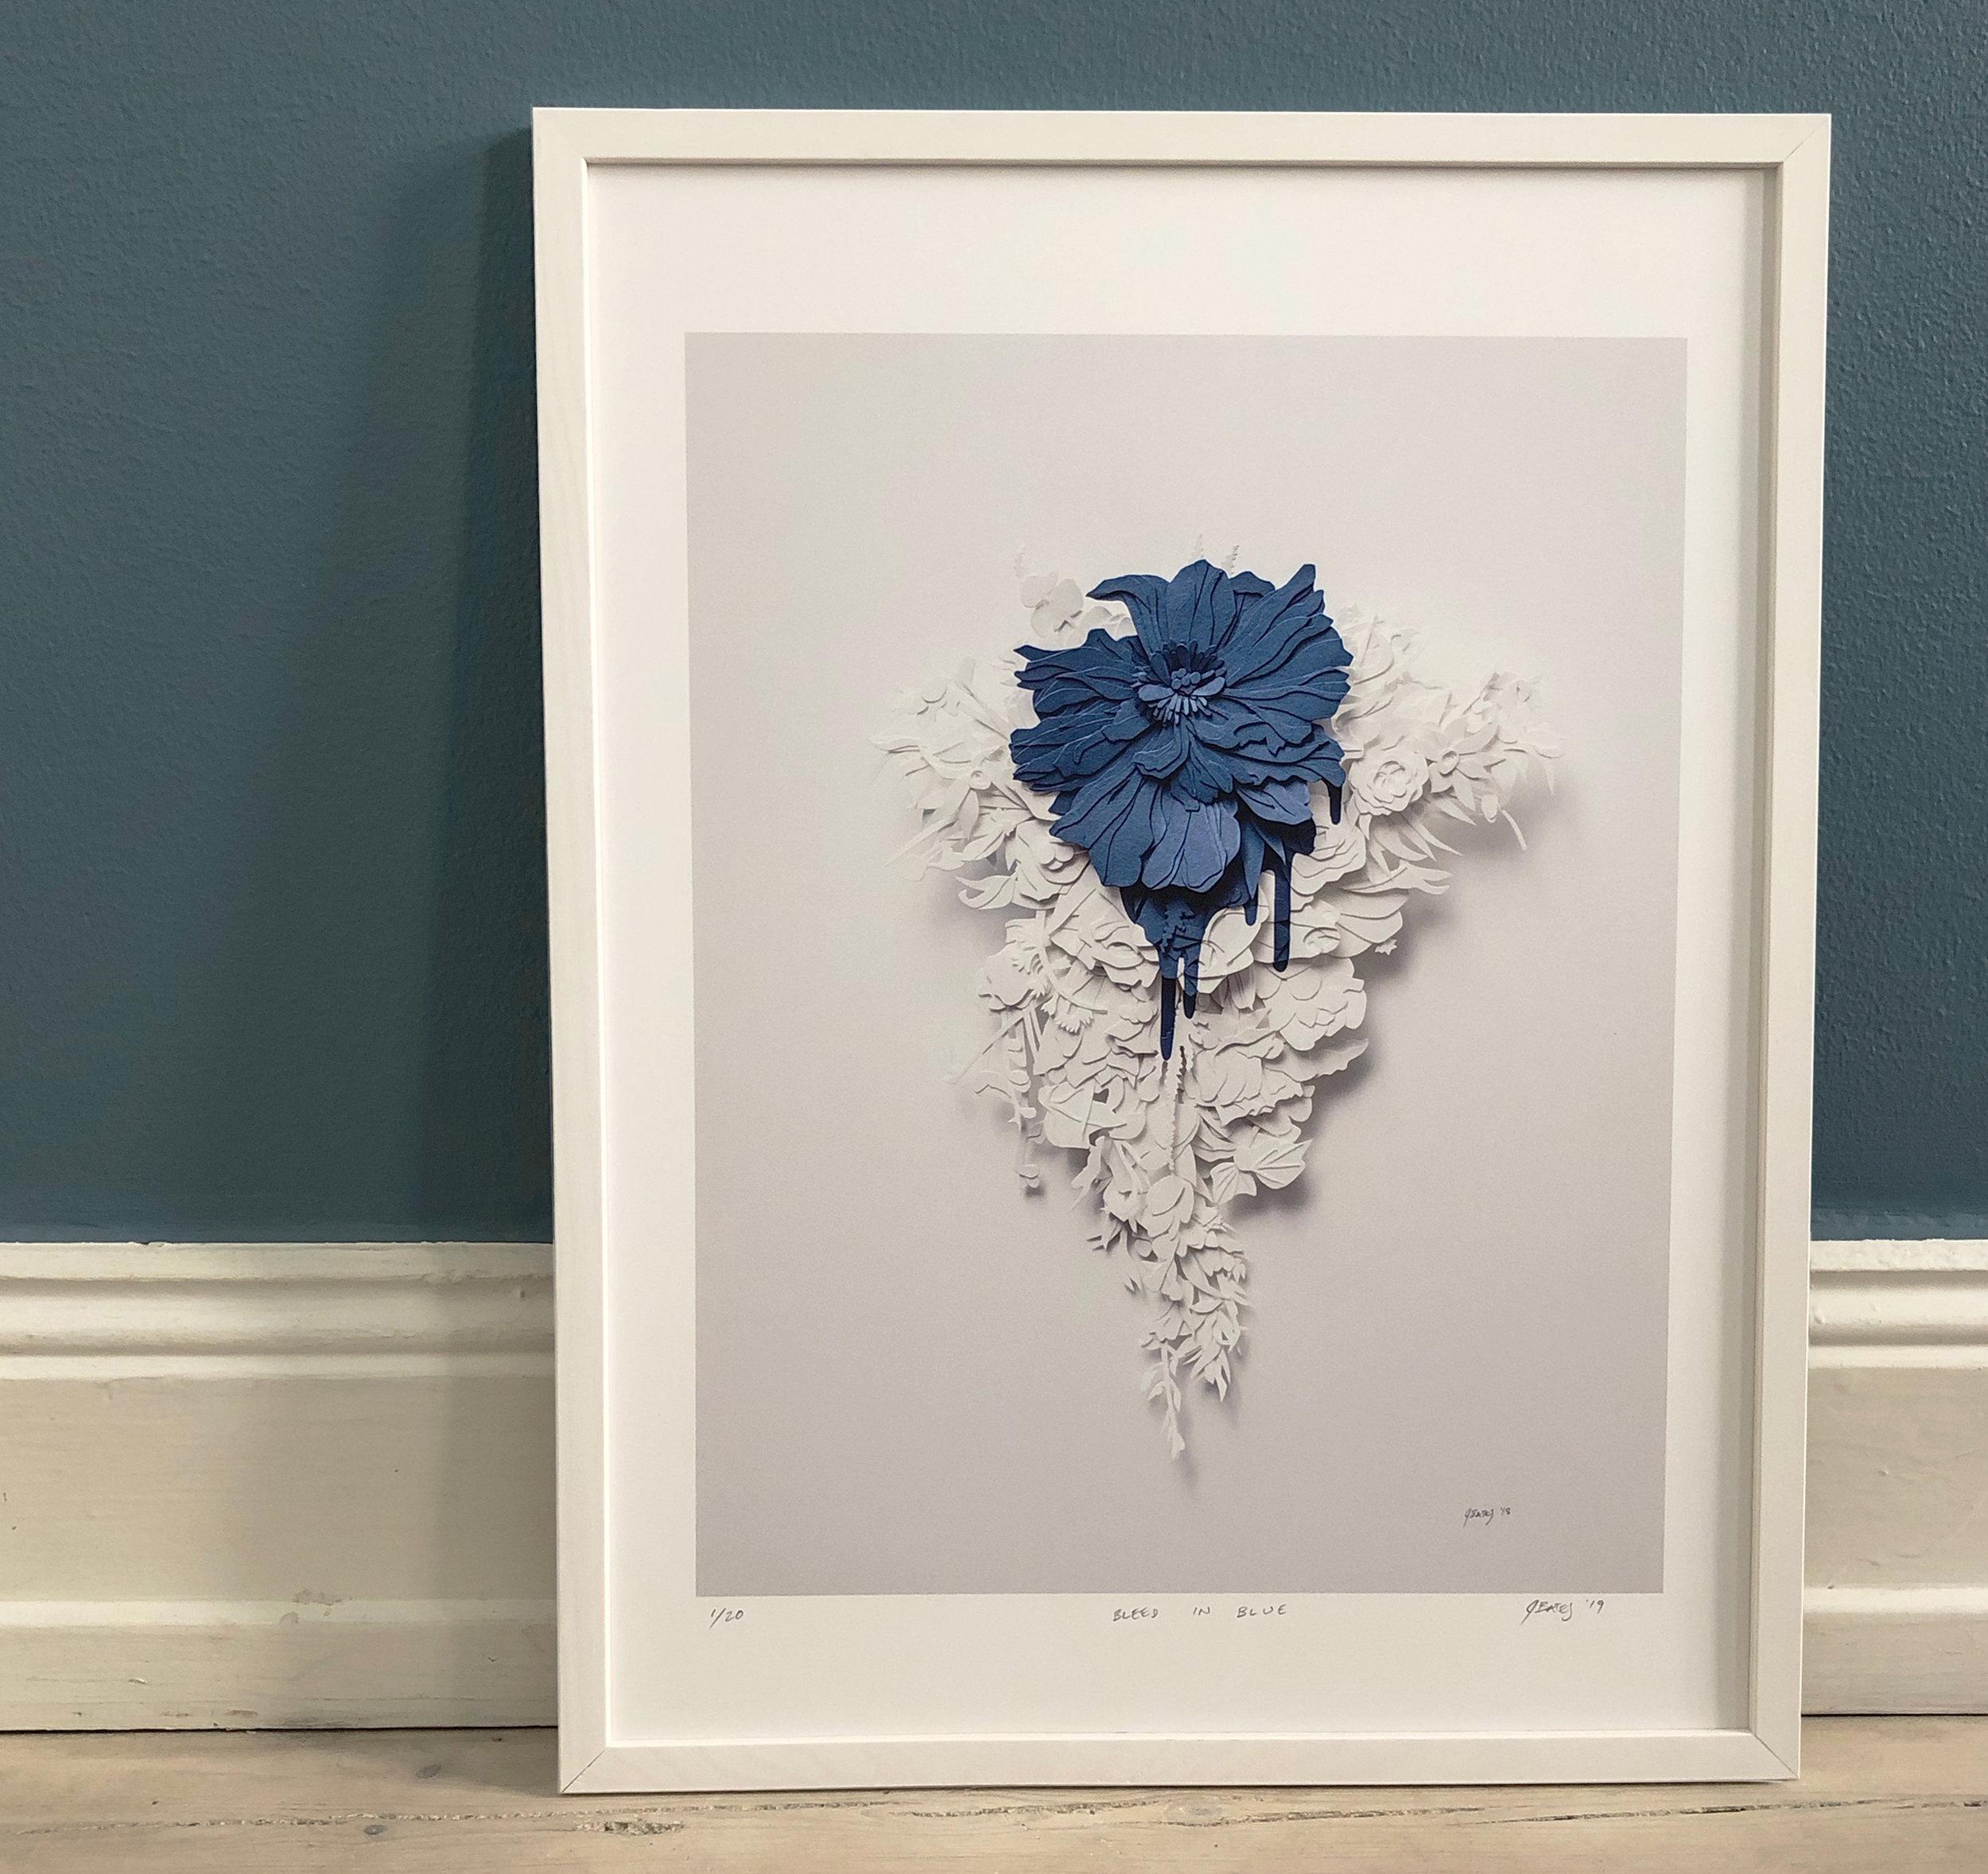 Bleed in Blue print framed in a 30 x 40cm frame